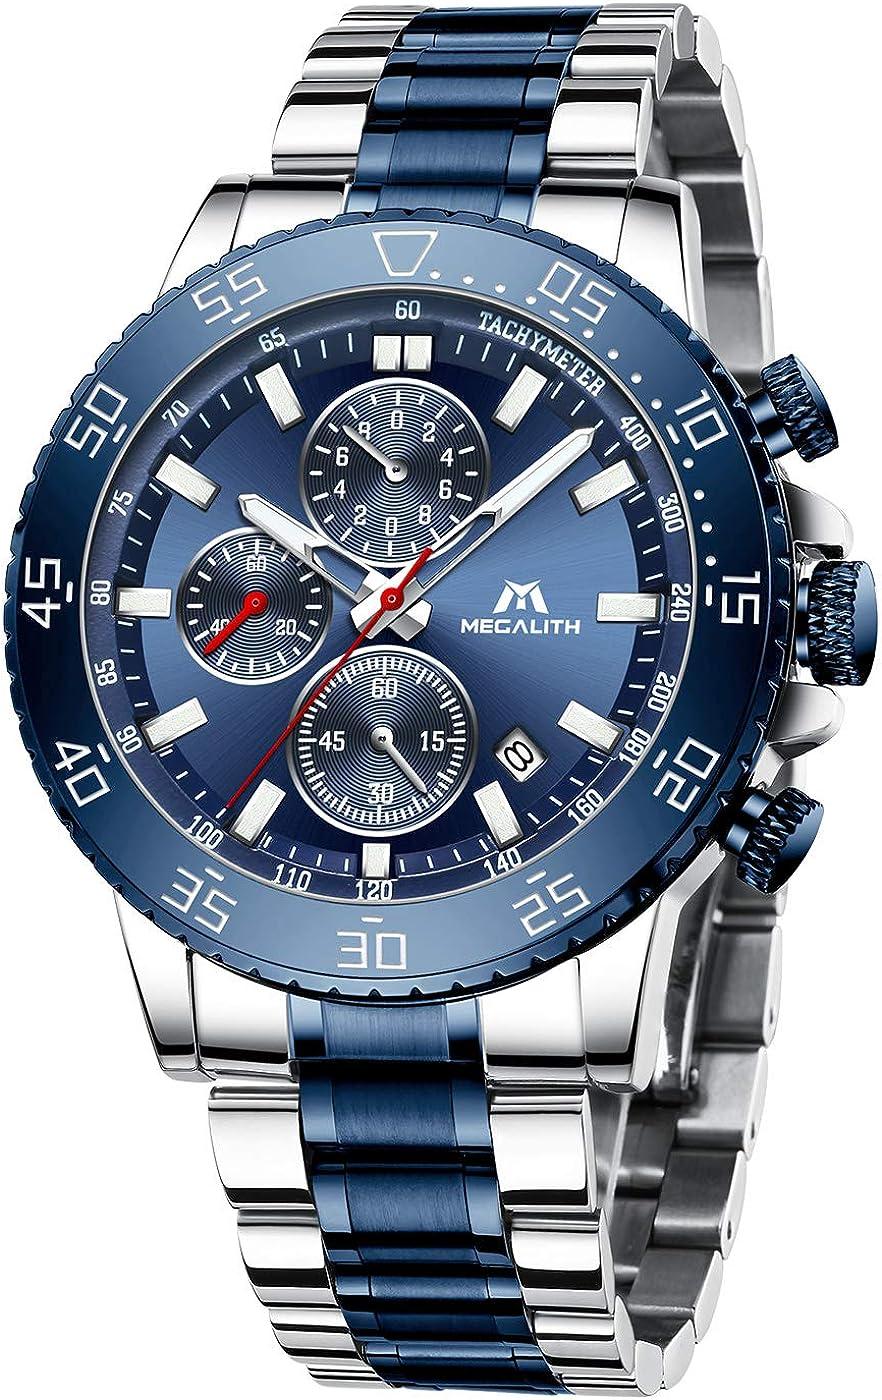 MEGALITH Relojes Hombre Reloj Cronografo Elegante Azul Acero Inoxidable Luminosos Impermeable de Diseño Relojes Grandes de Pulsera Negro Deportivos Analogicos Fecha